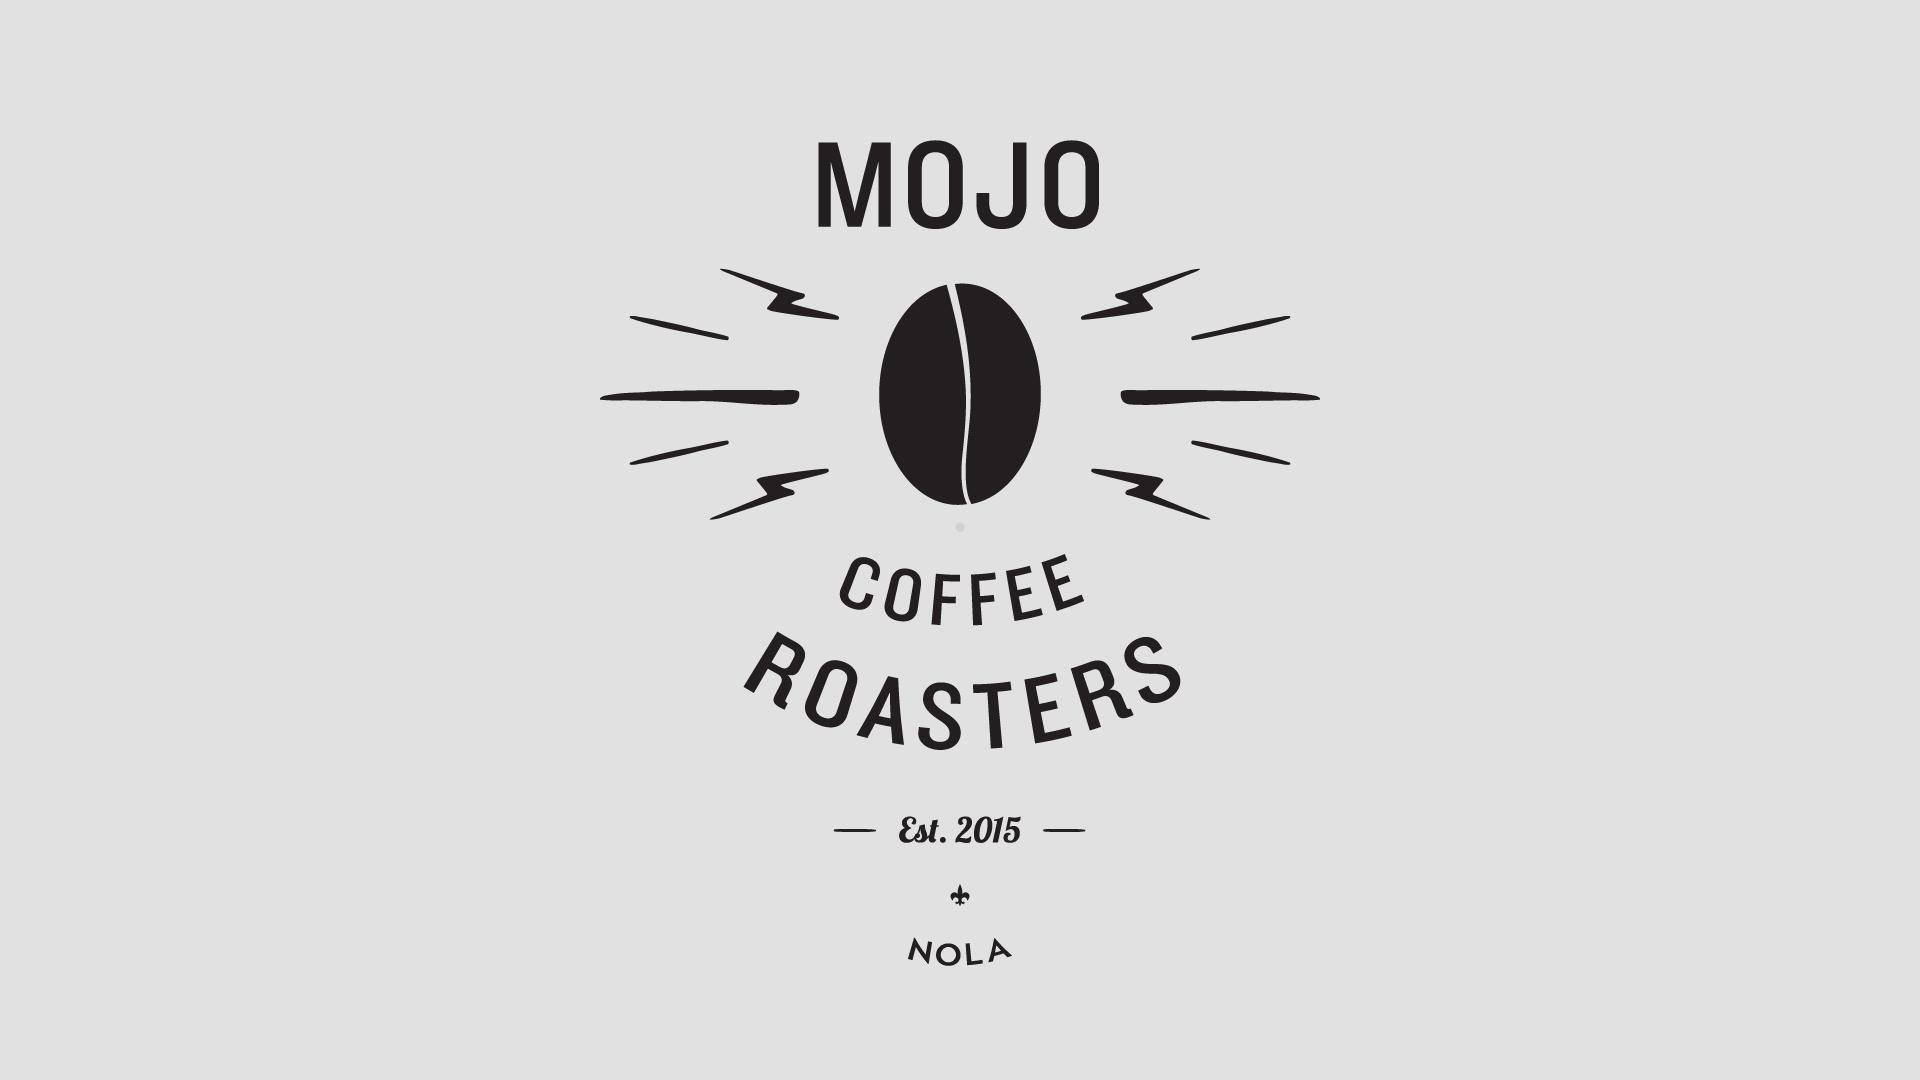 mojo-coffee-roaster-logo.jpg